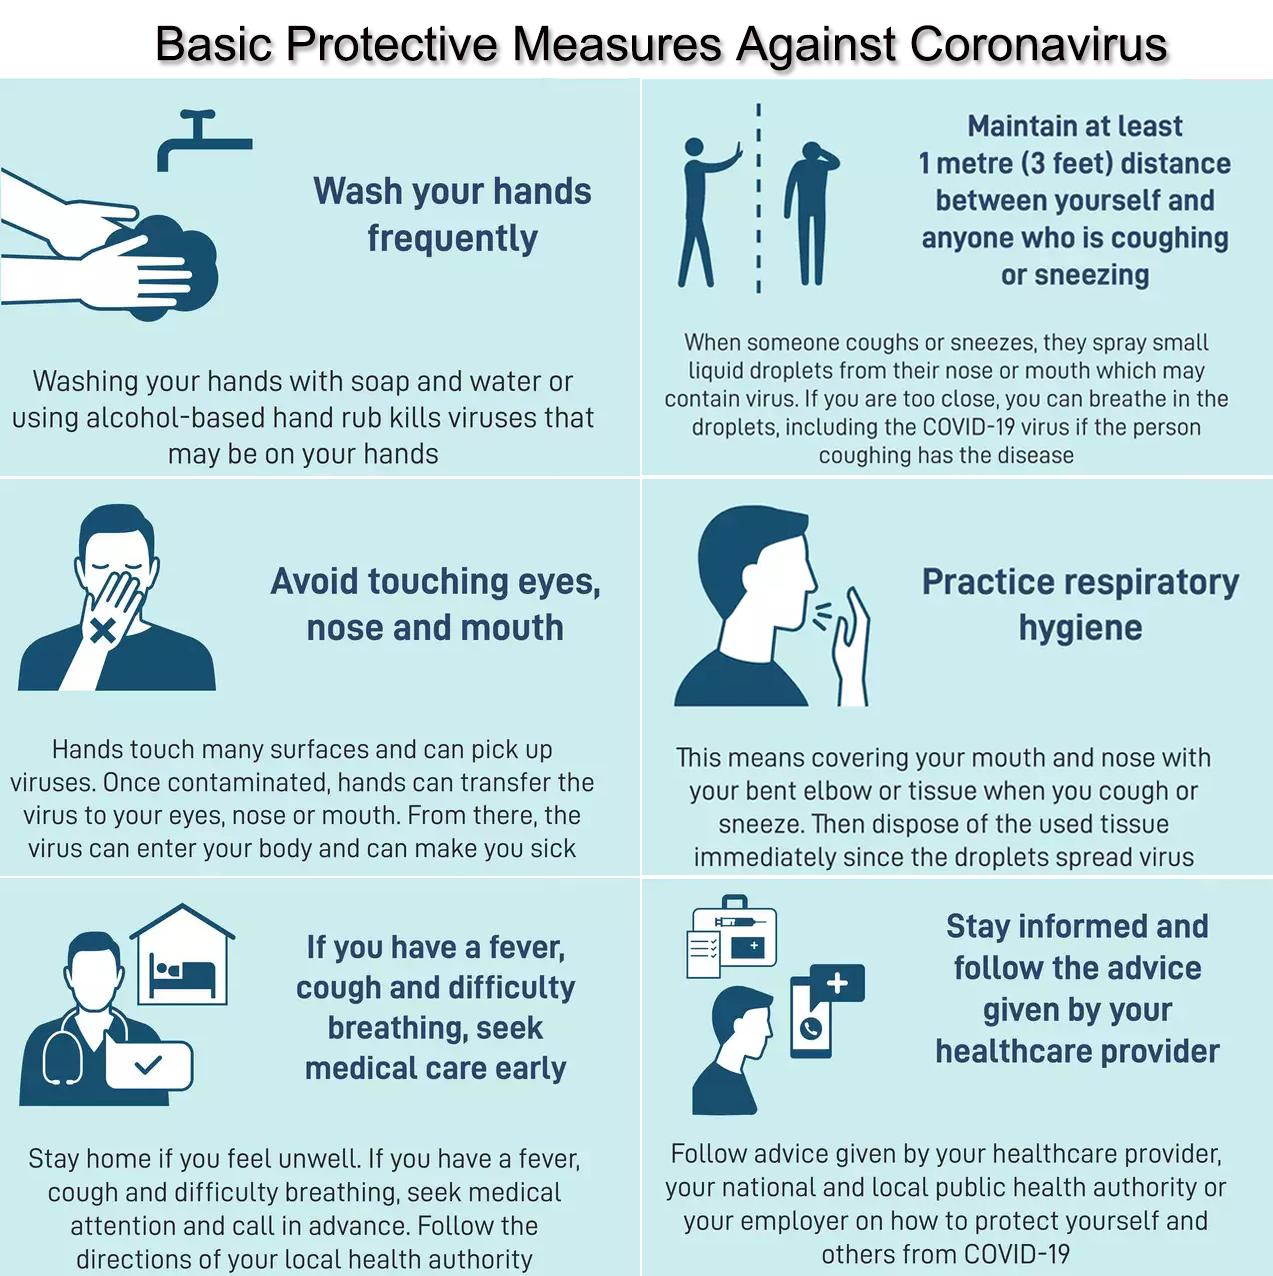 Basic protective measures against the novel coronavirus